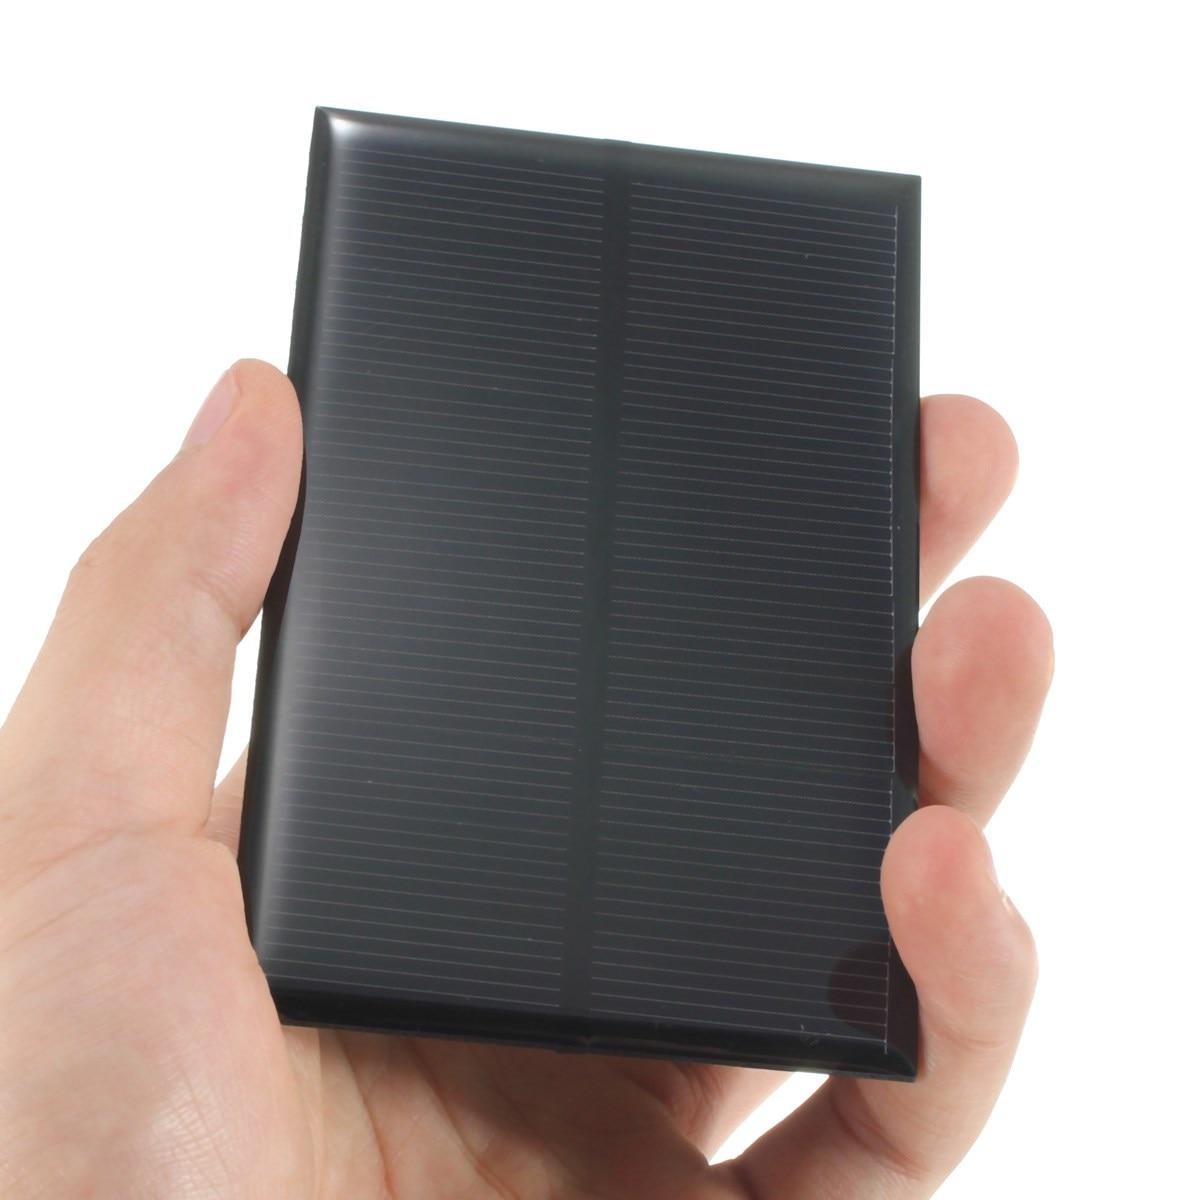 цена 5V 1.25W 250mA Monocrystalline Silicon Epoxy Solar Panels Module kits Mini Solar Cells For Charging Cellphone Battery 110x70mm